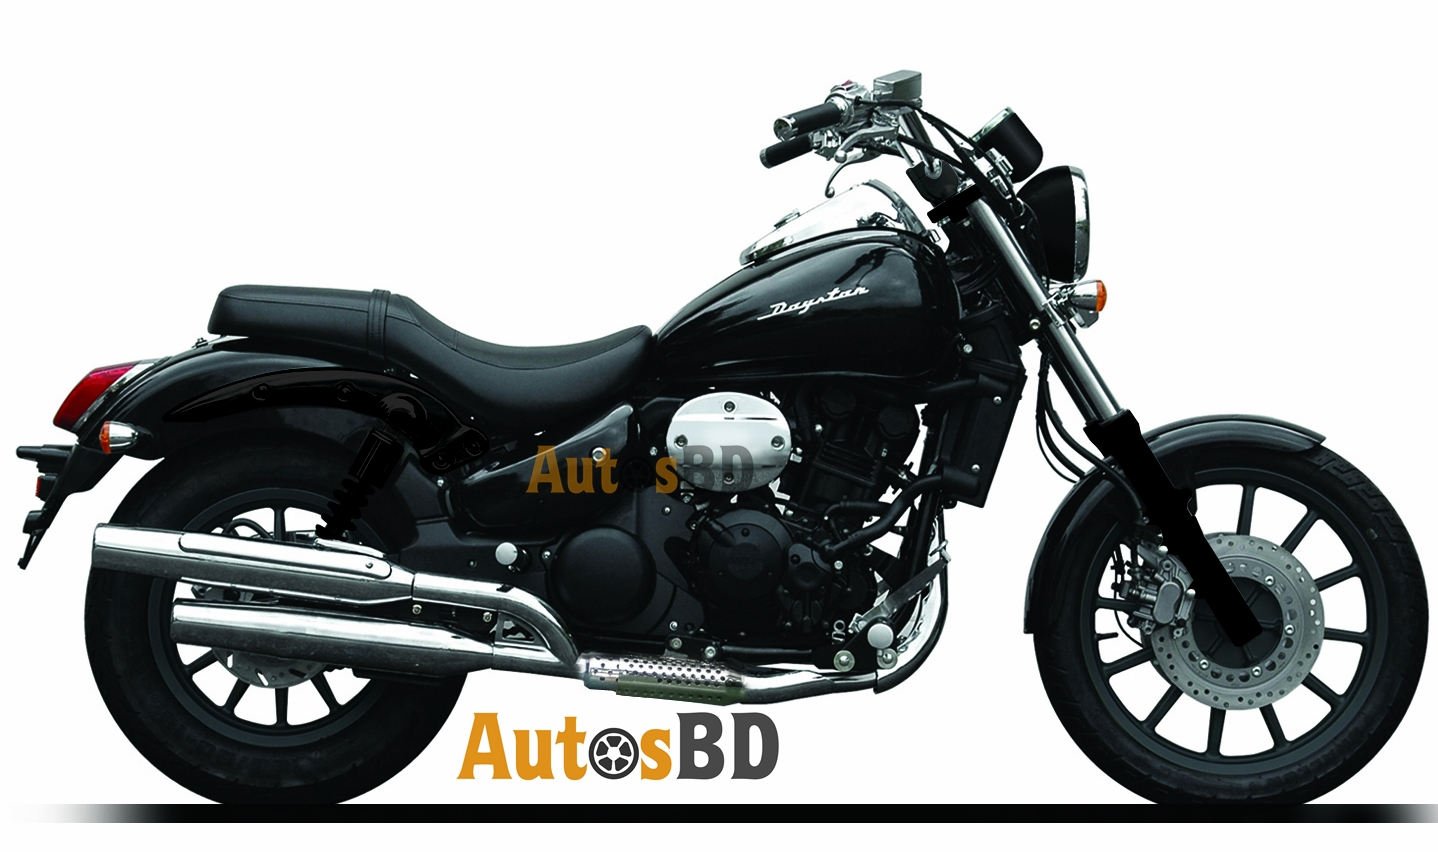 Daelim Daystar 2017 Motorcycle Specification